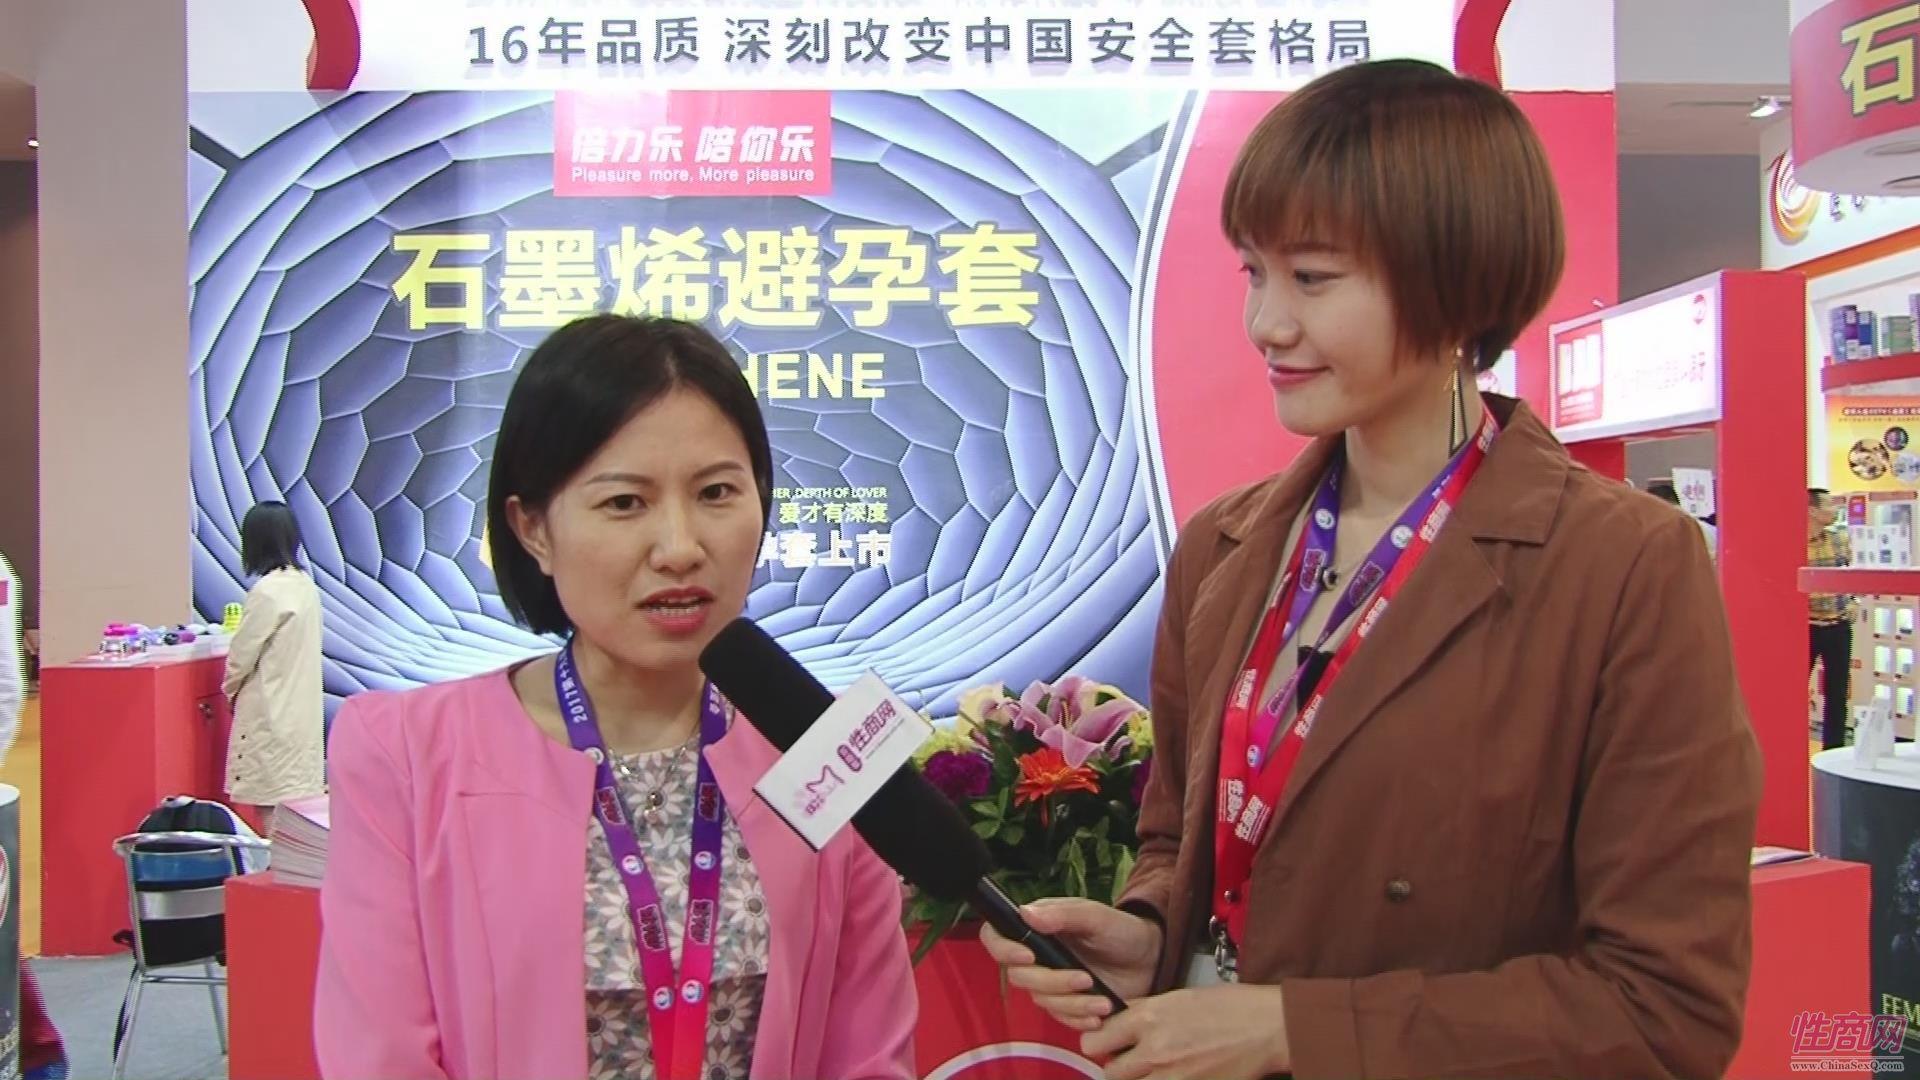 性shang网记者采访bei力le安全tao